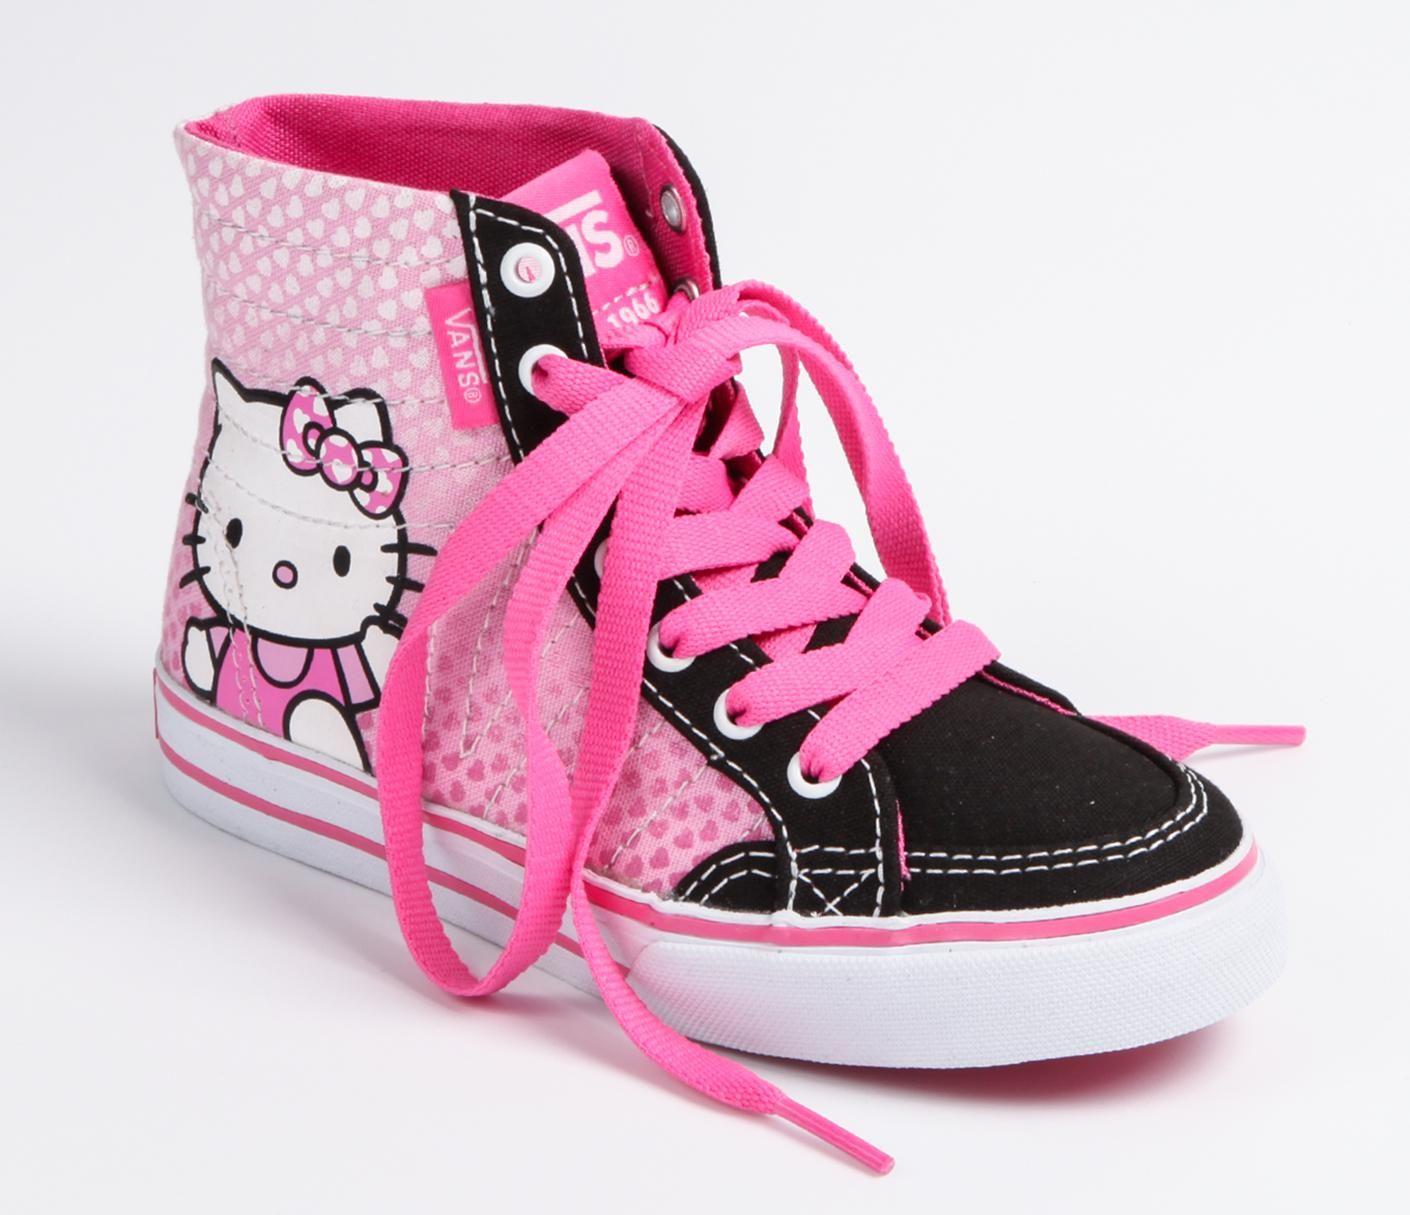 827997343c6e22 VANS x Hello Kitty Kids Authentic Hi-Top  Pink